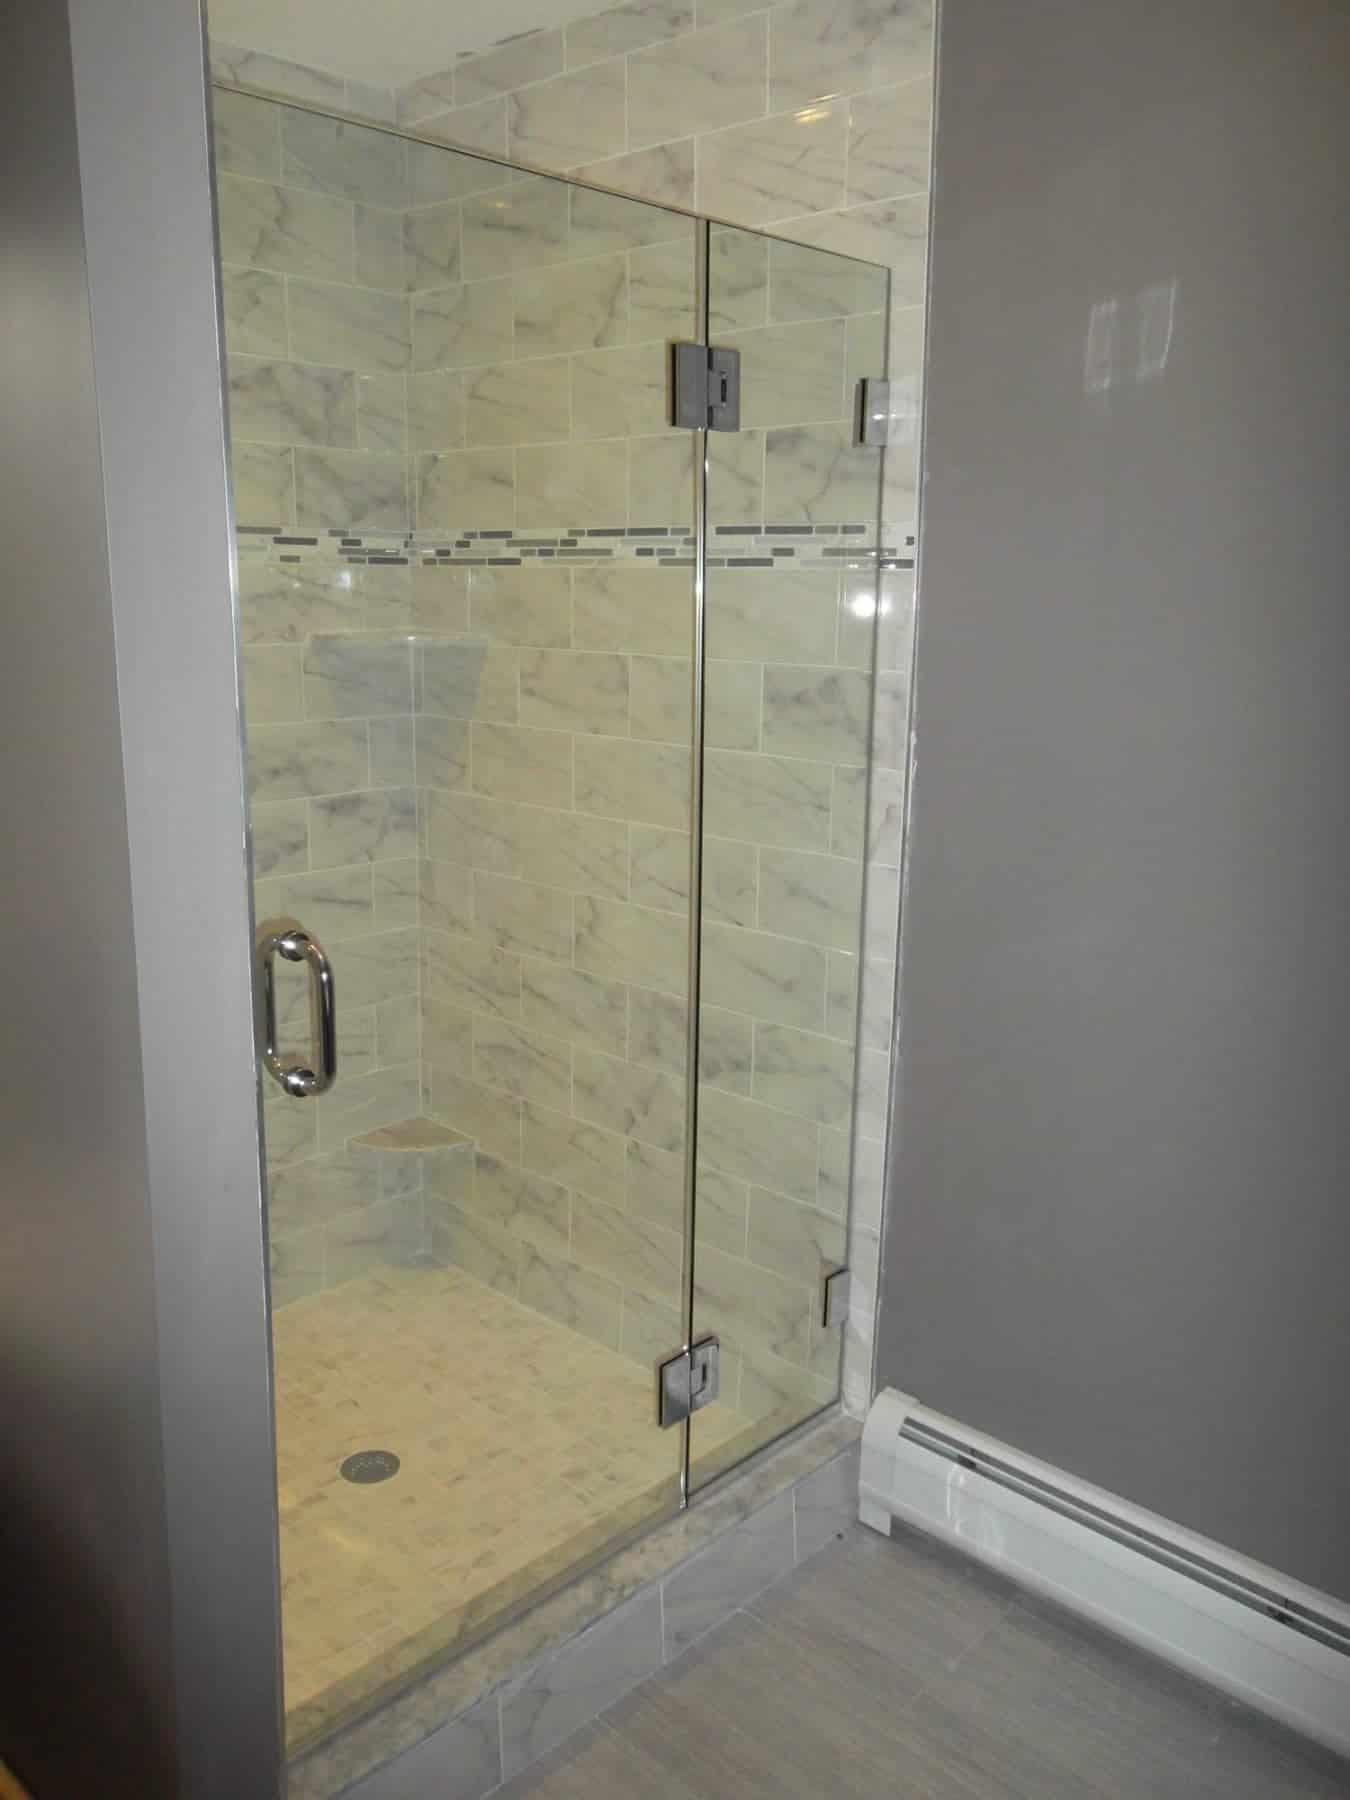 Frameless Shower Enclosure Door Hinging Off Of Panel